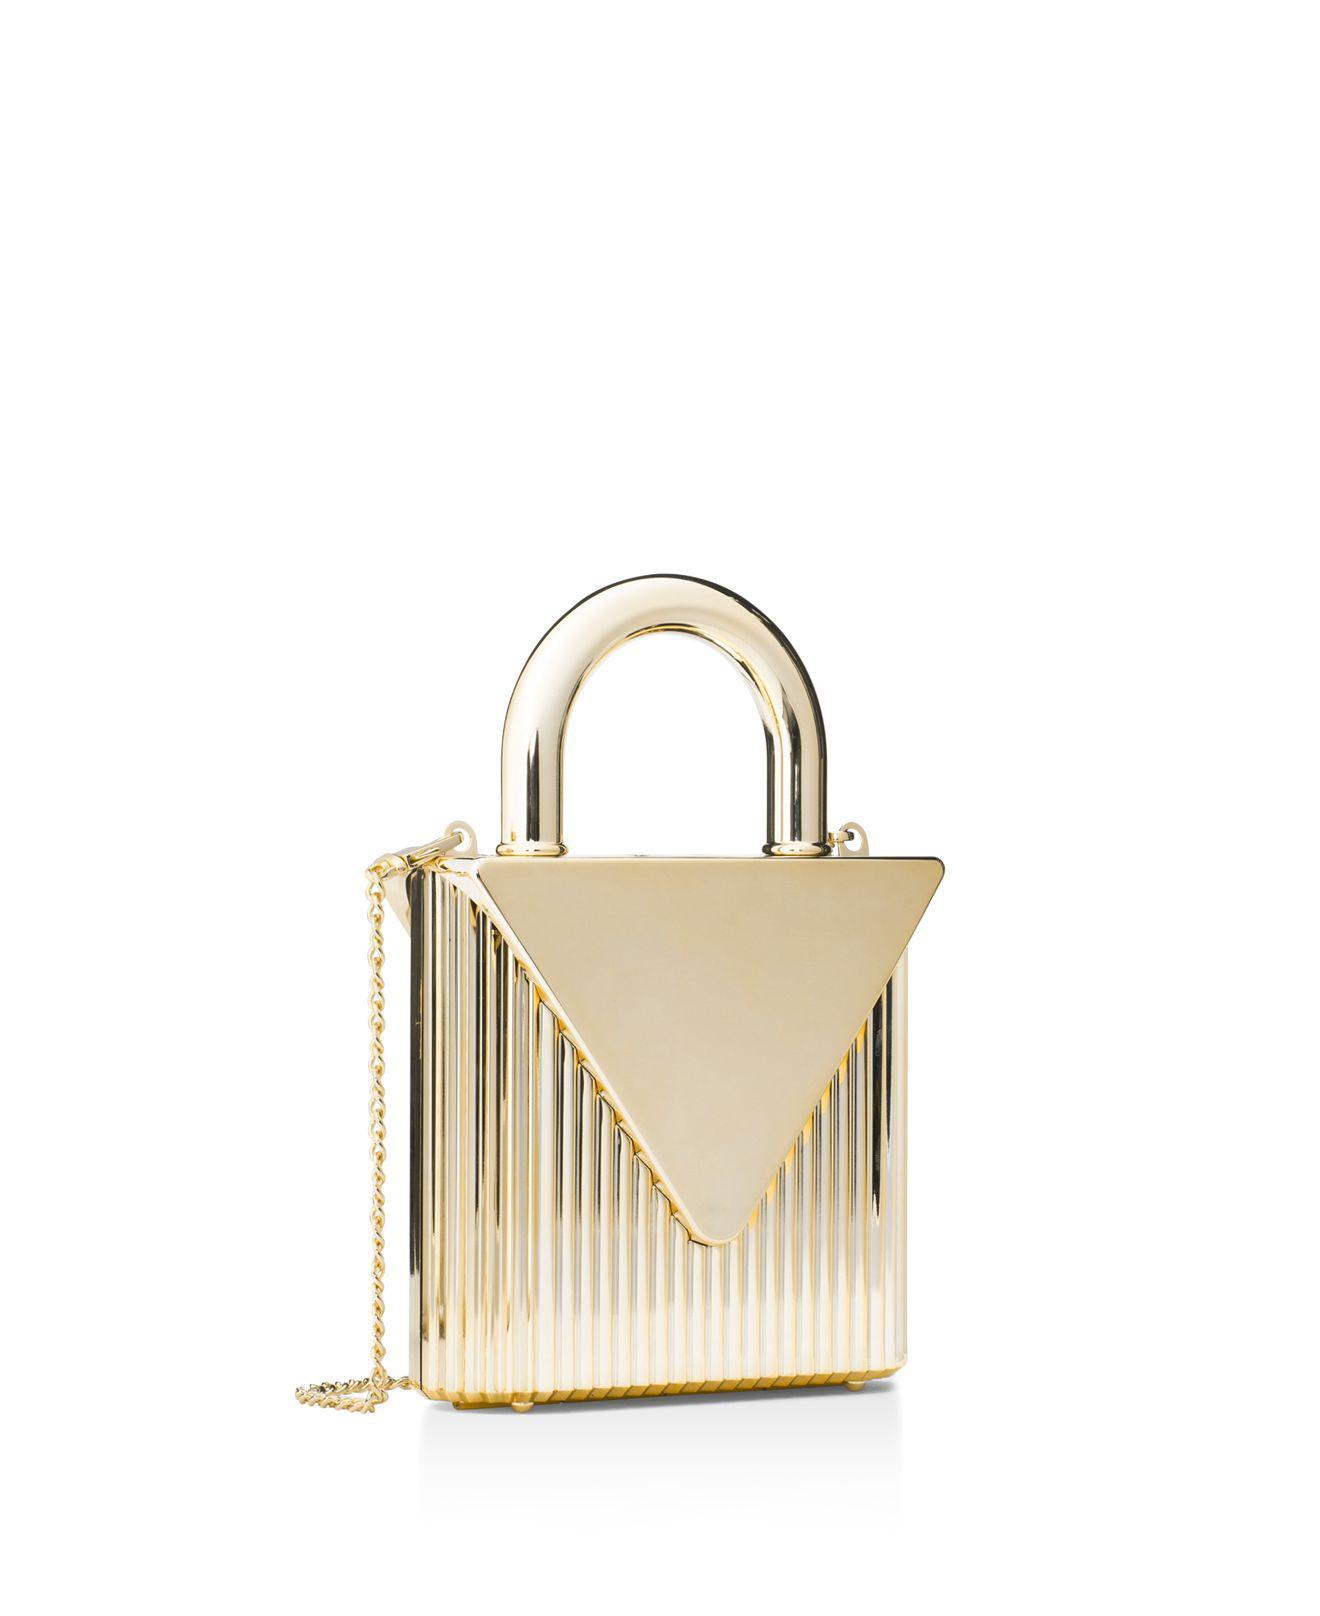 00f823ae9802 Michael Kors Mercer Oversized Locked Clutch in Metallic - Lyst